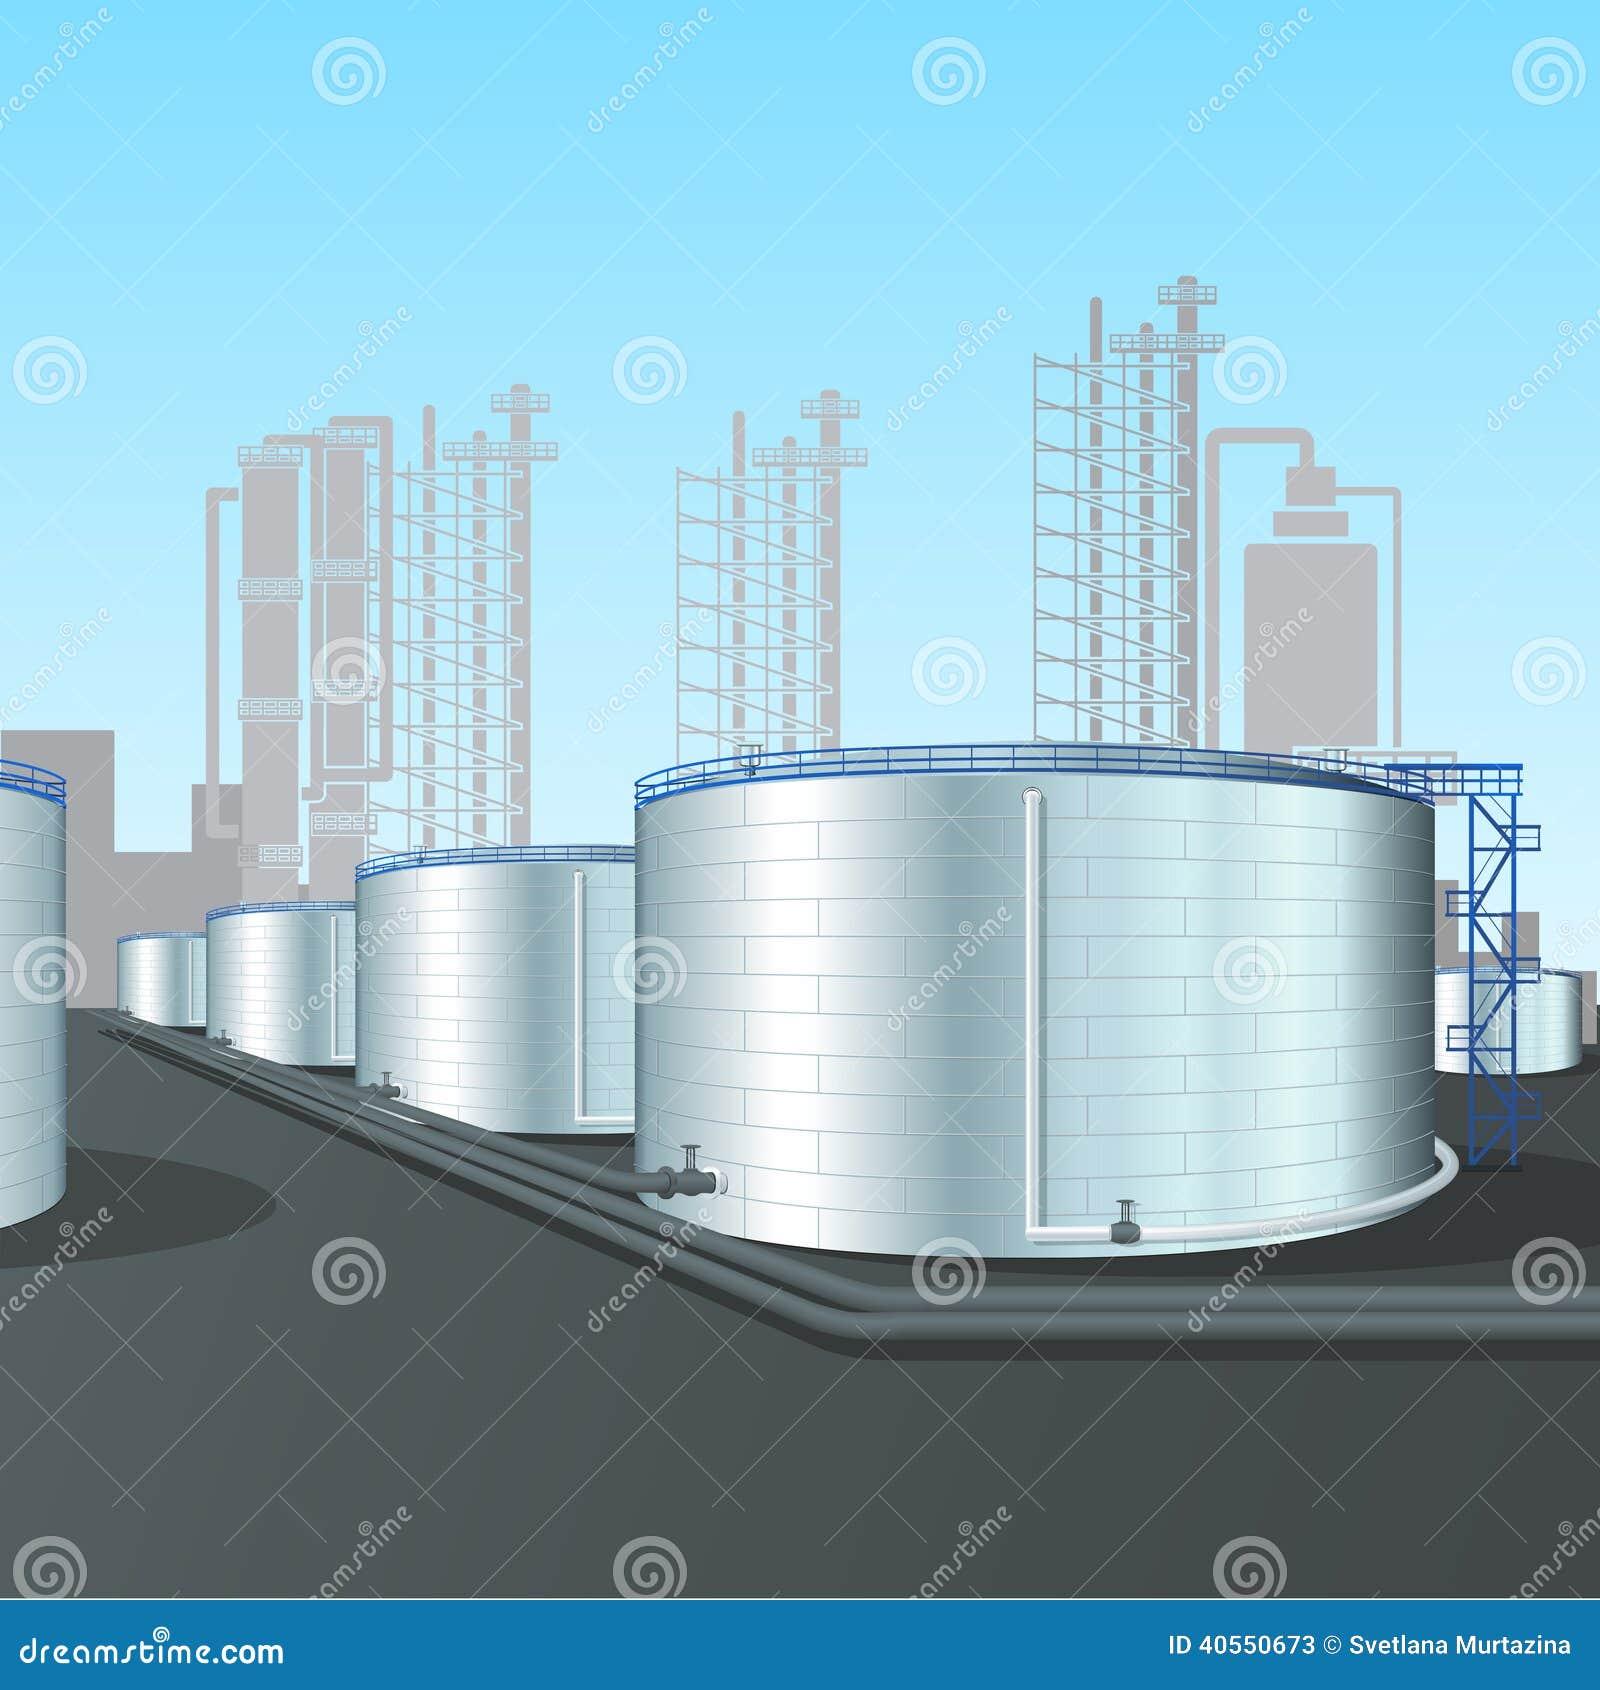 Refinery Vertical Steel Tank Farm With Pipeline Stock